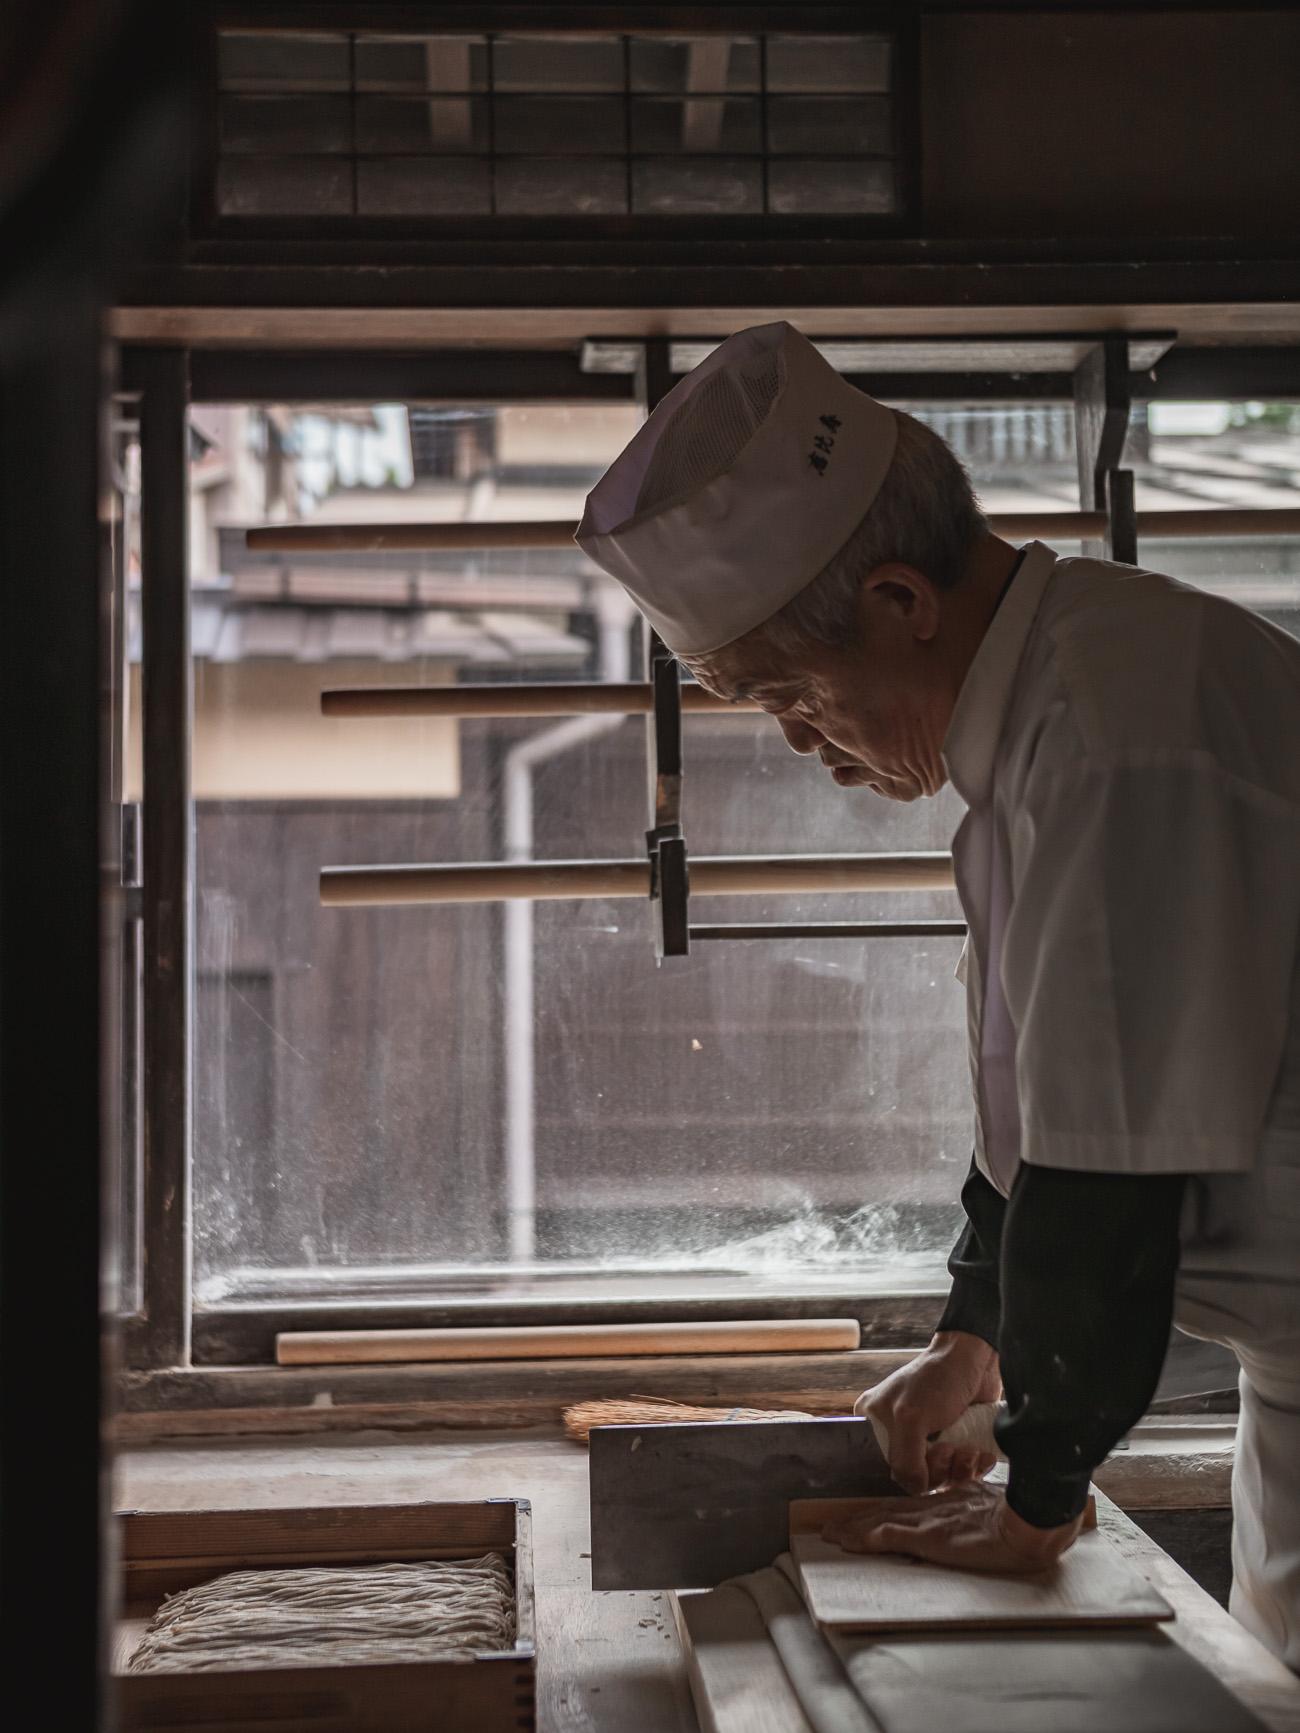 takayama sannomachi ebisu honten